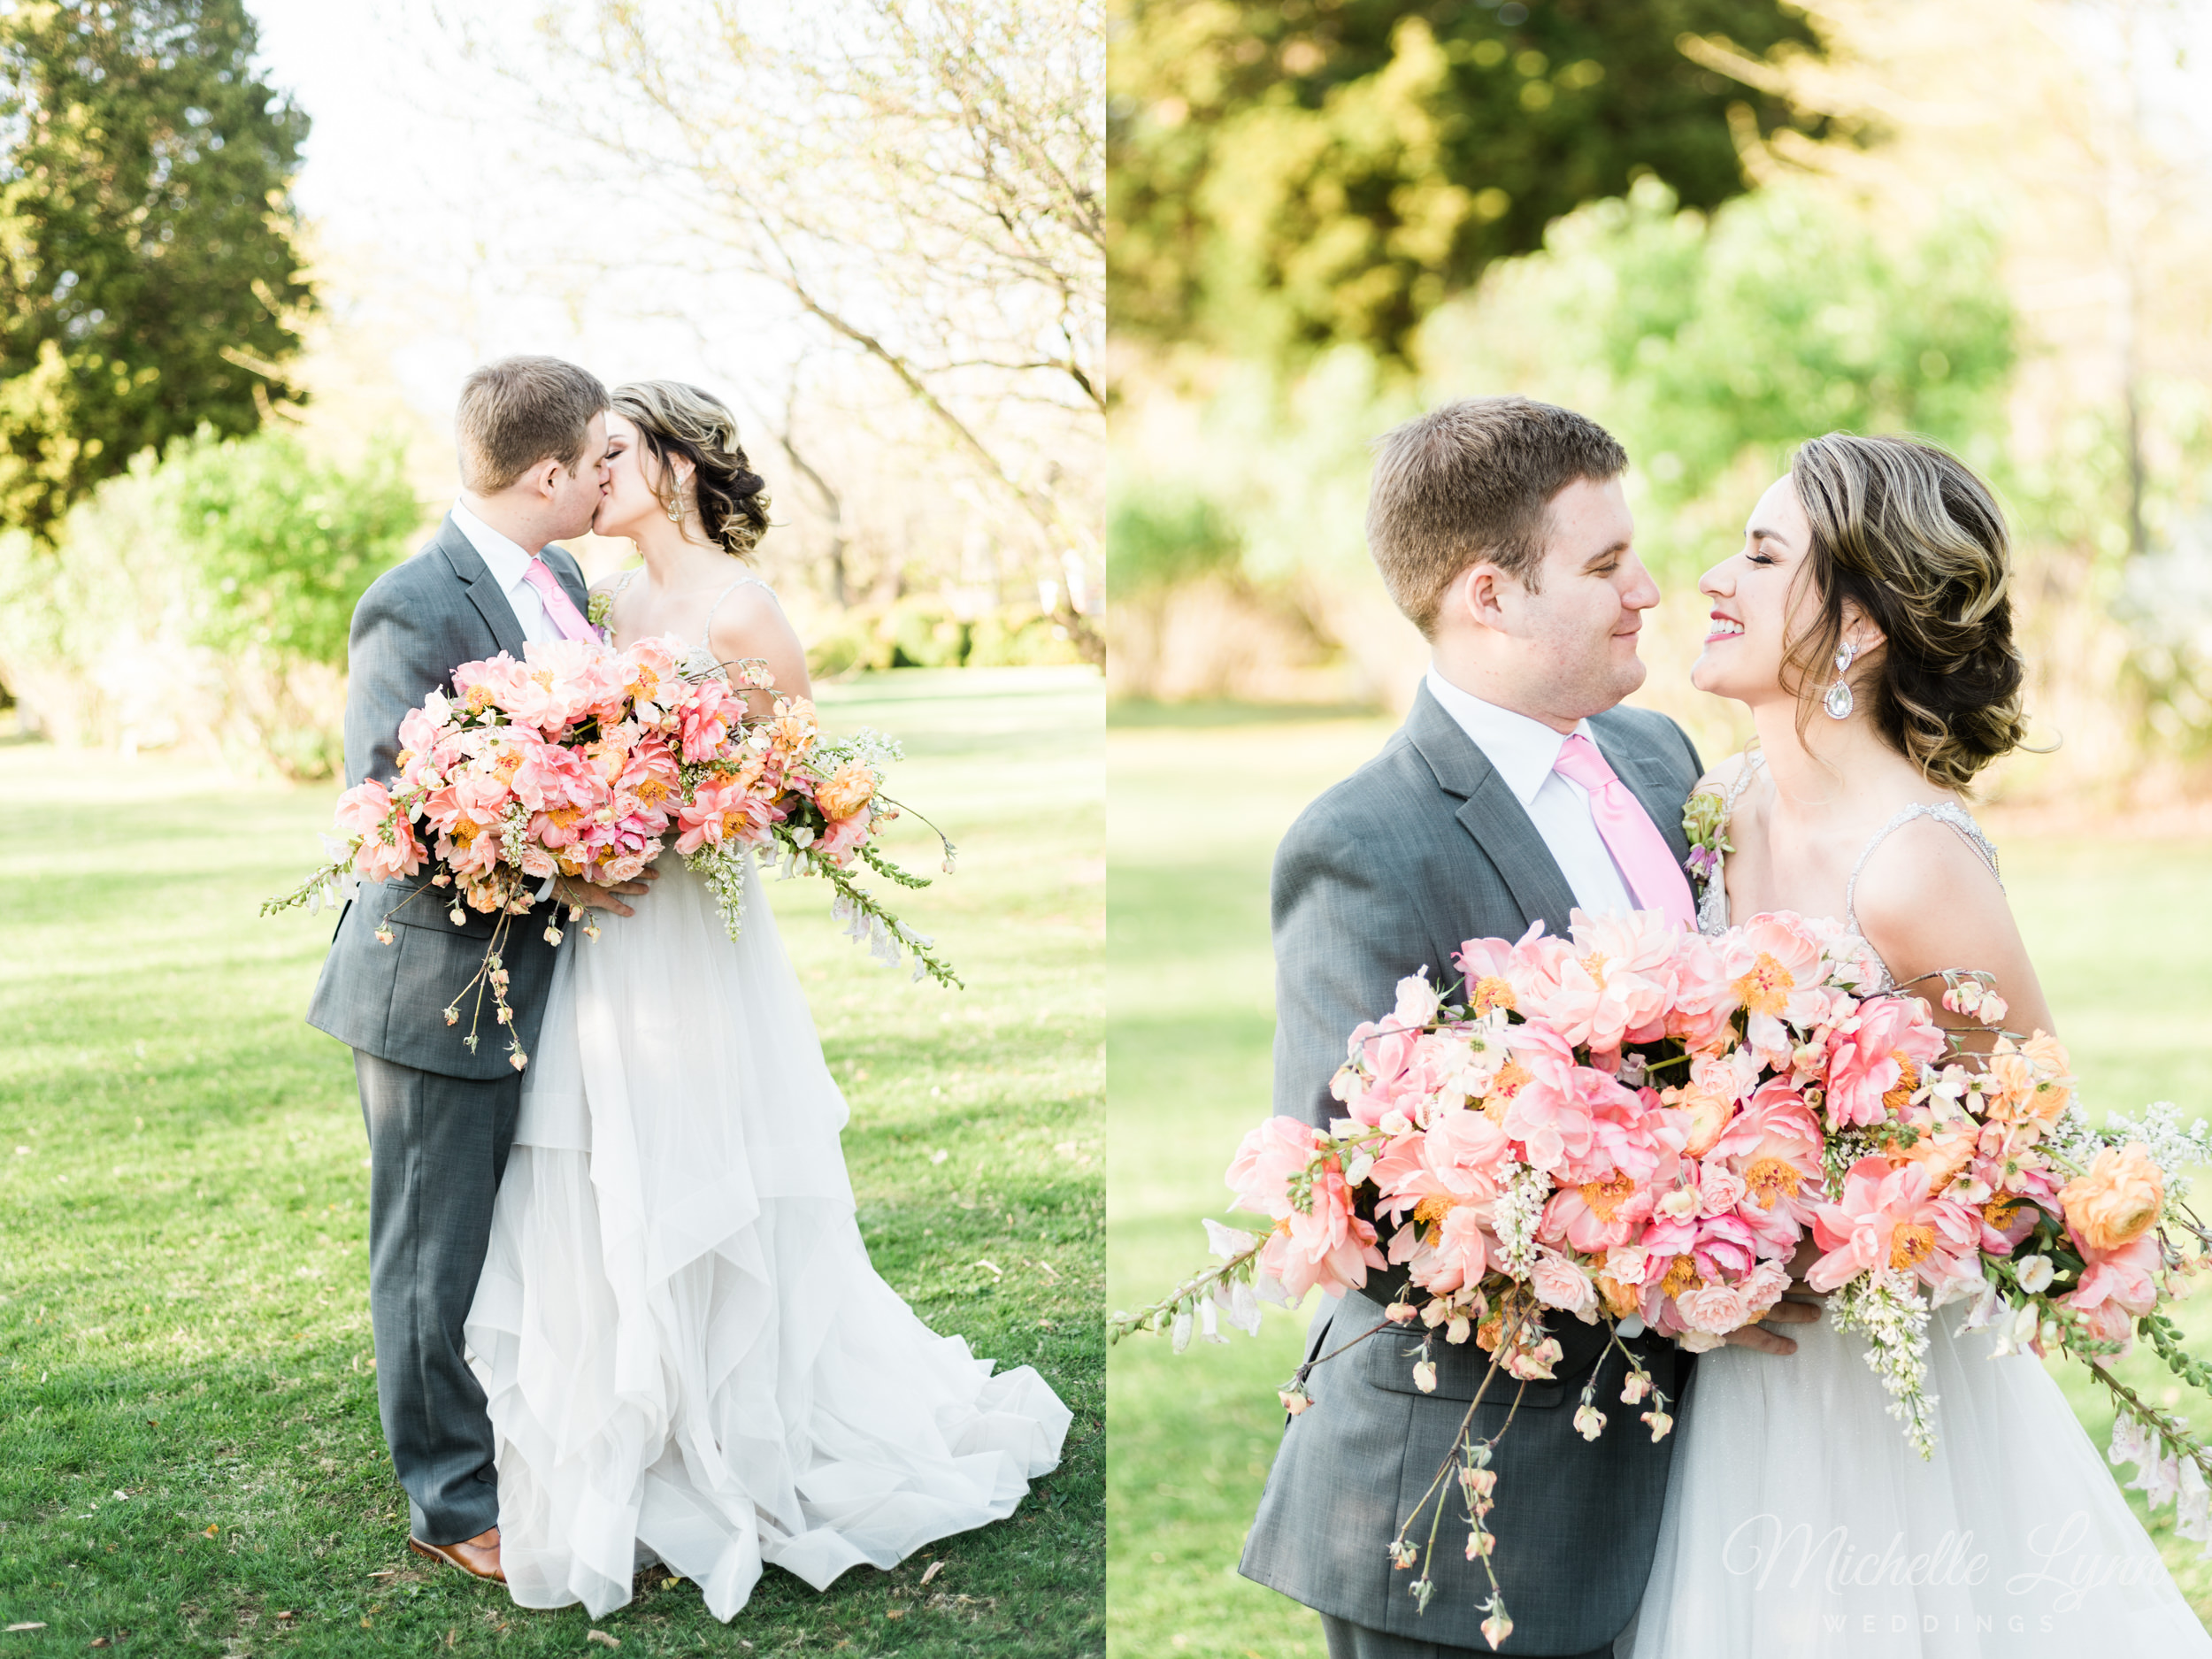 mlw-whitehall-annapolis-maryland-wedding-9.jpg